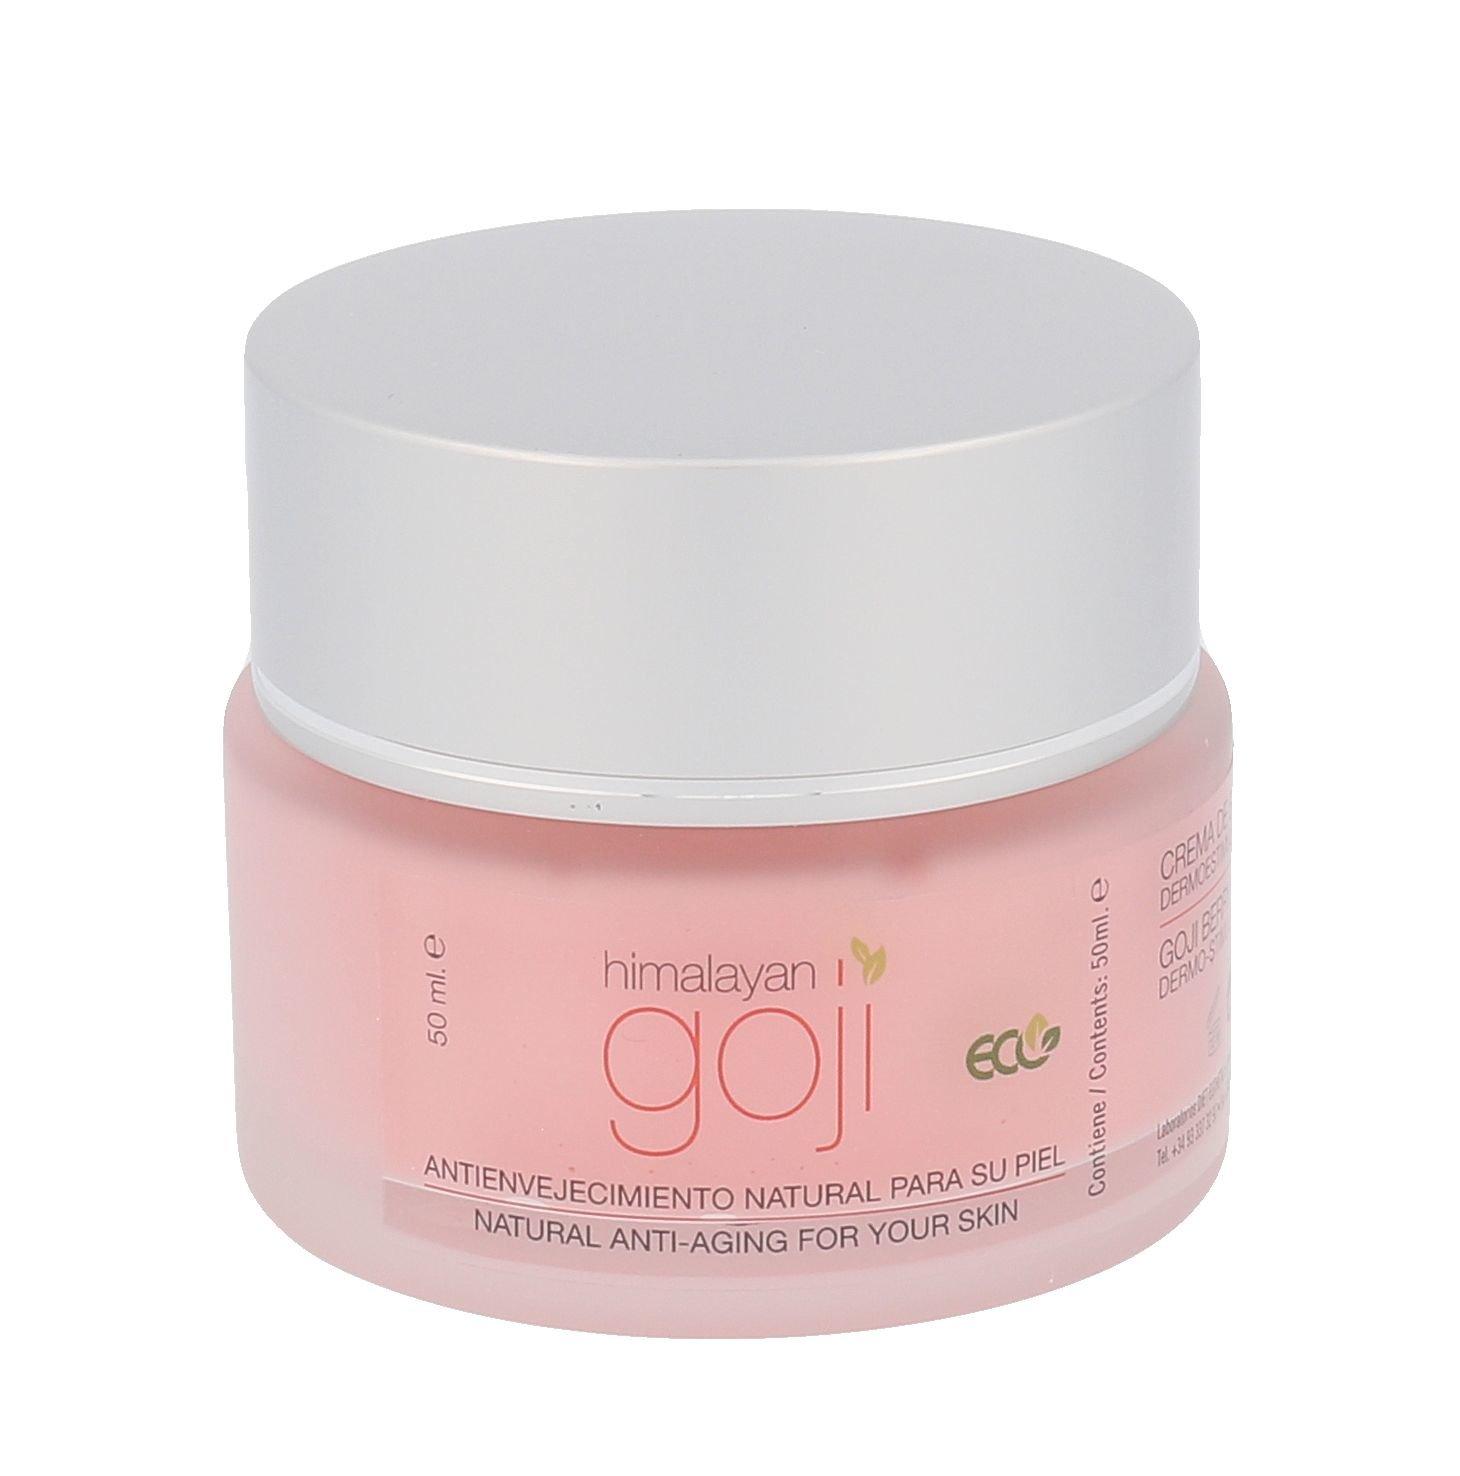 Diet Esthetic Himalayan Goji Cream